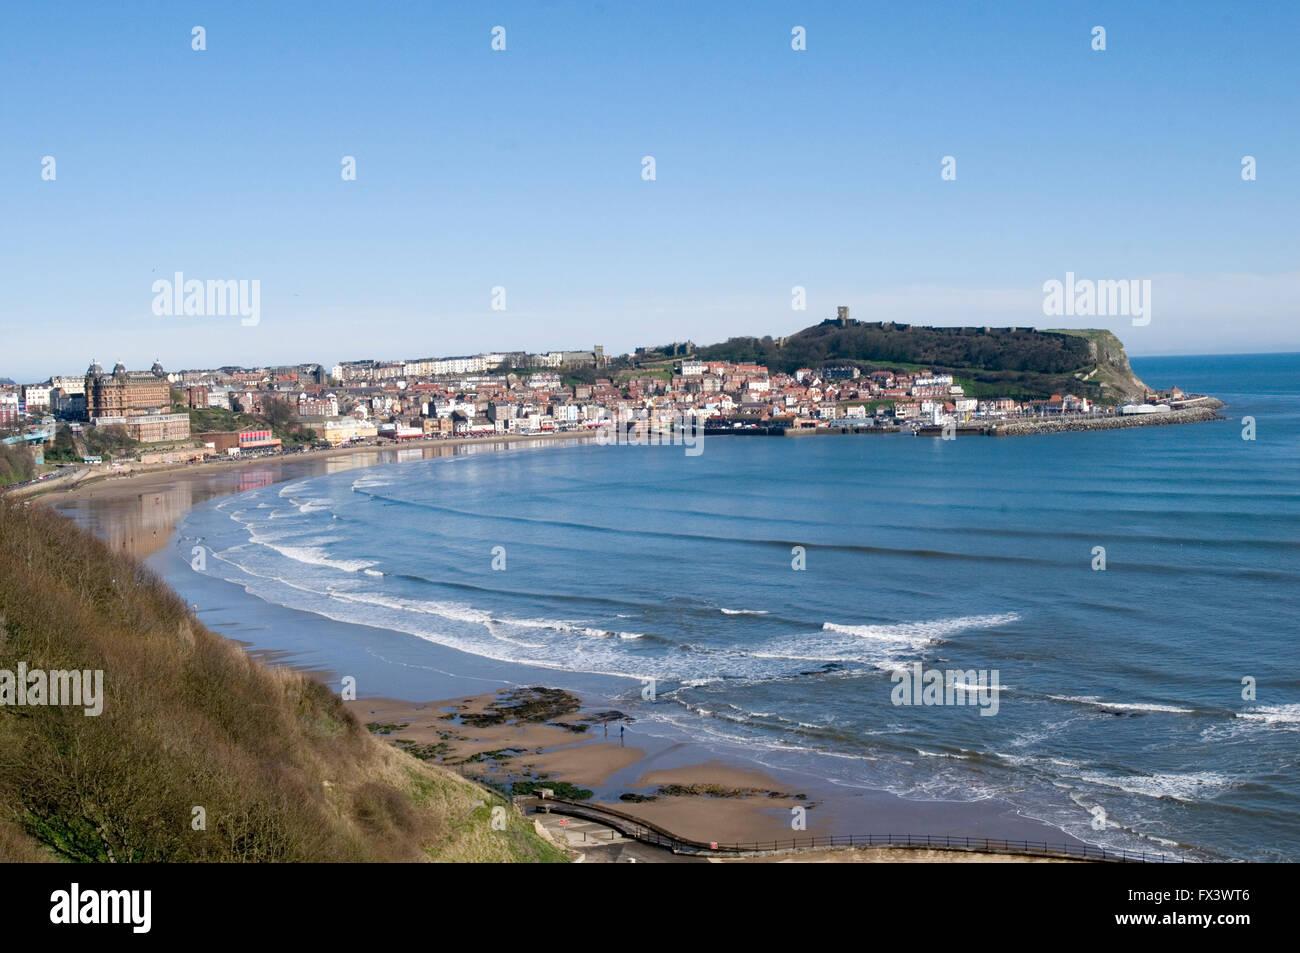 Scarborough bay yorkshire coast coastal town beach beaches seafront sea north east eastern uk - Stock Image